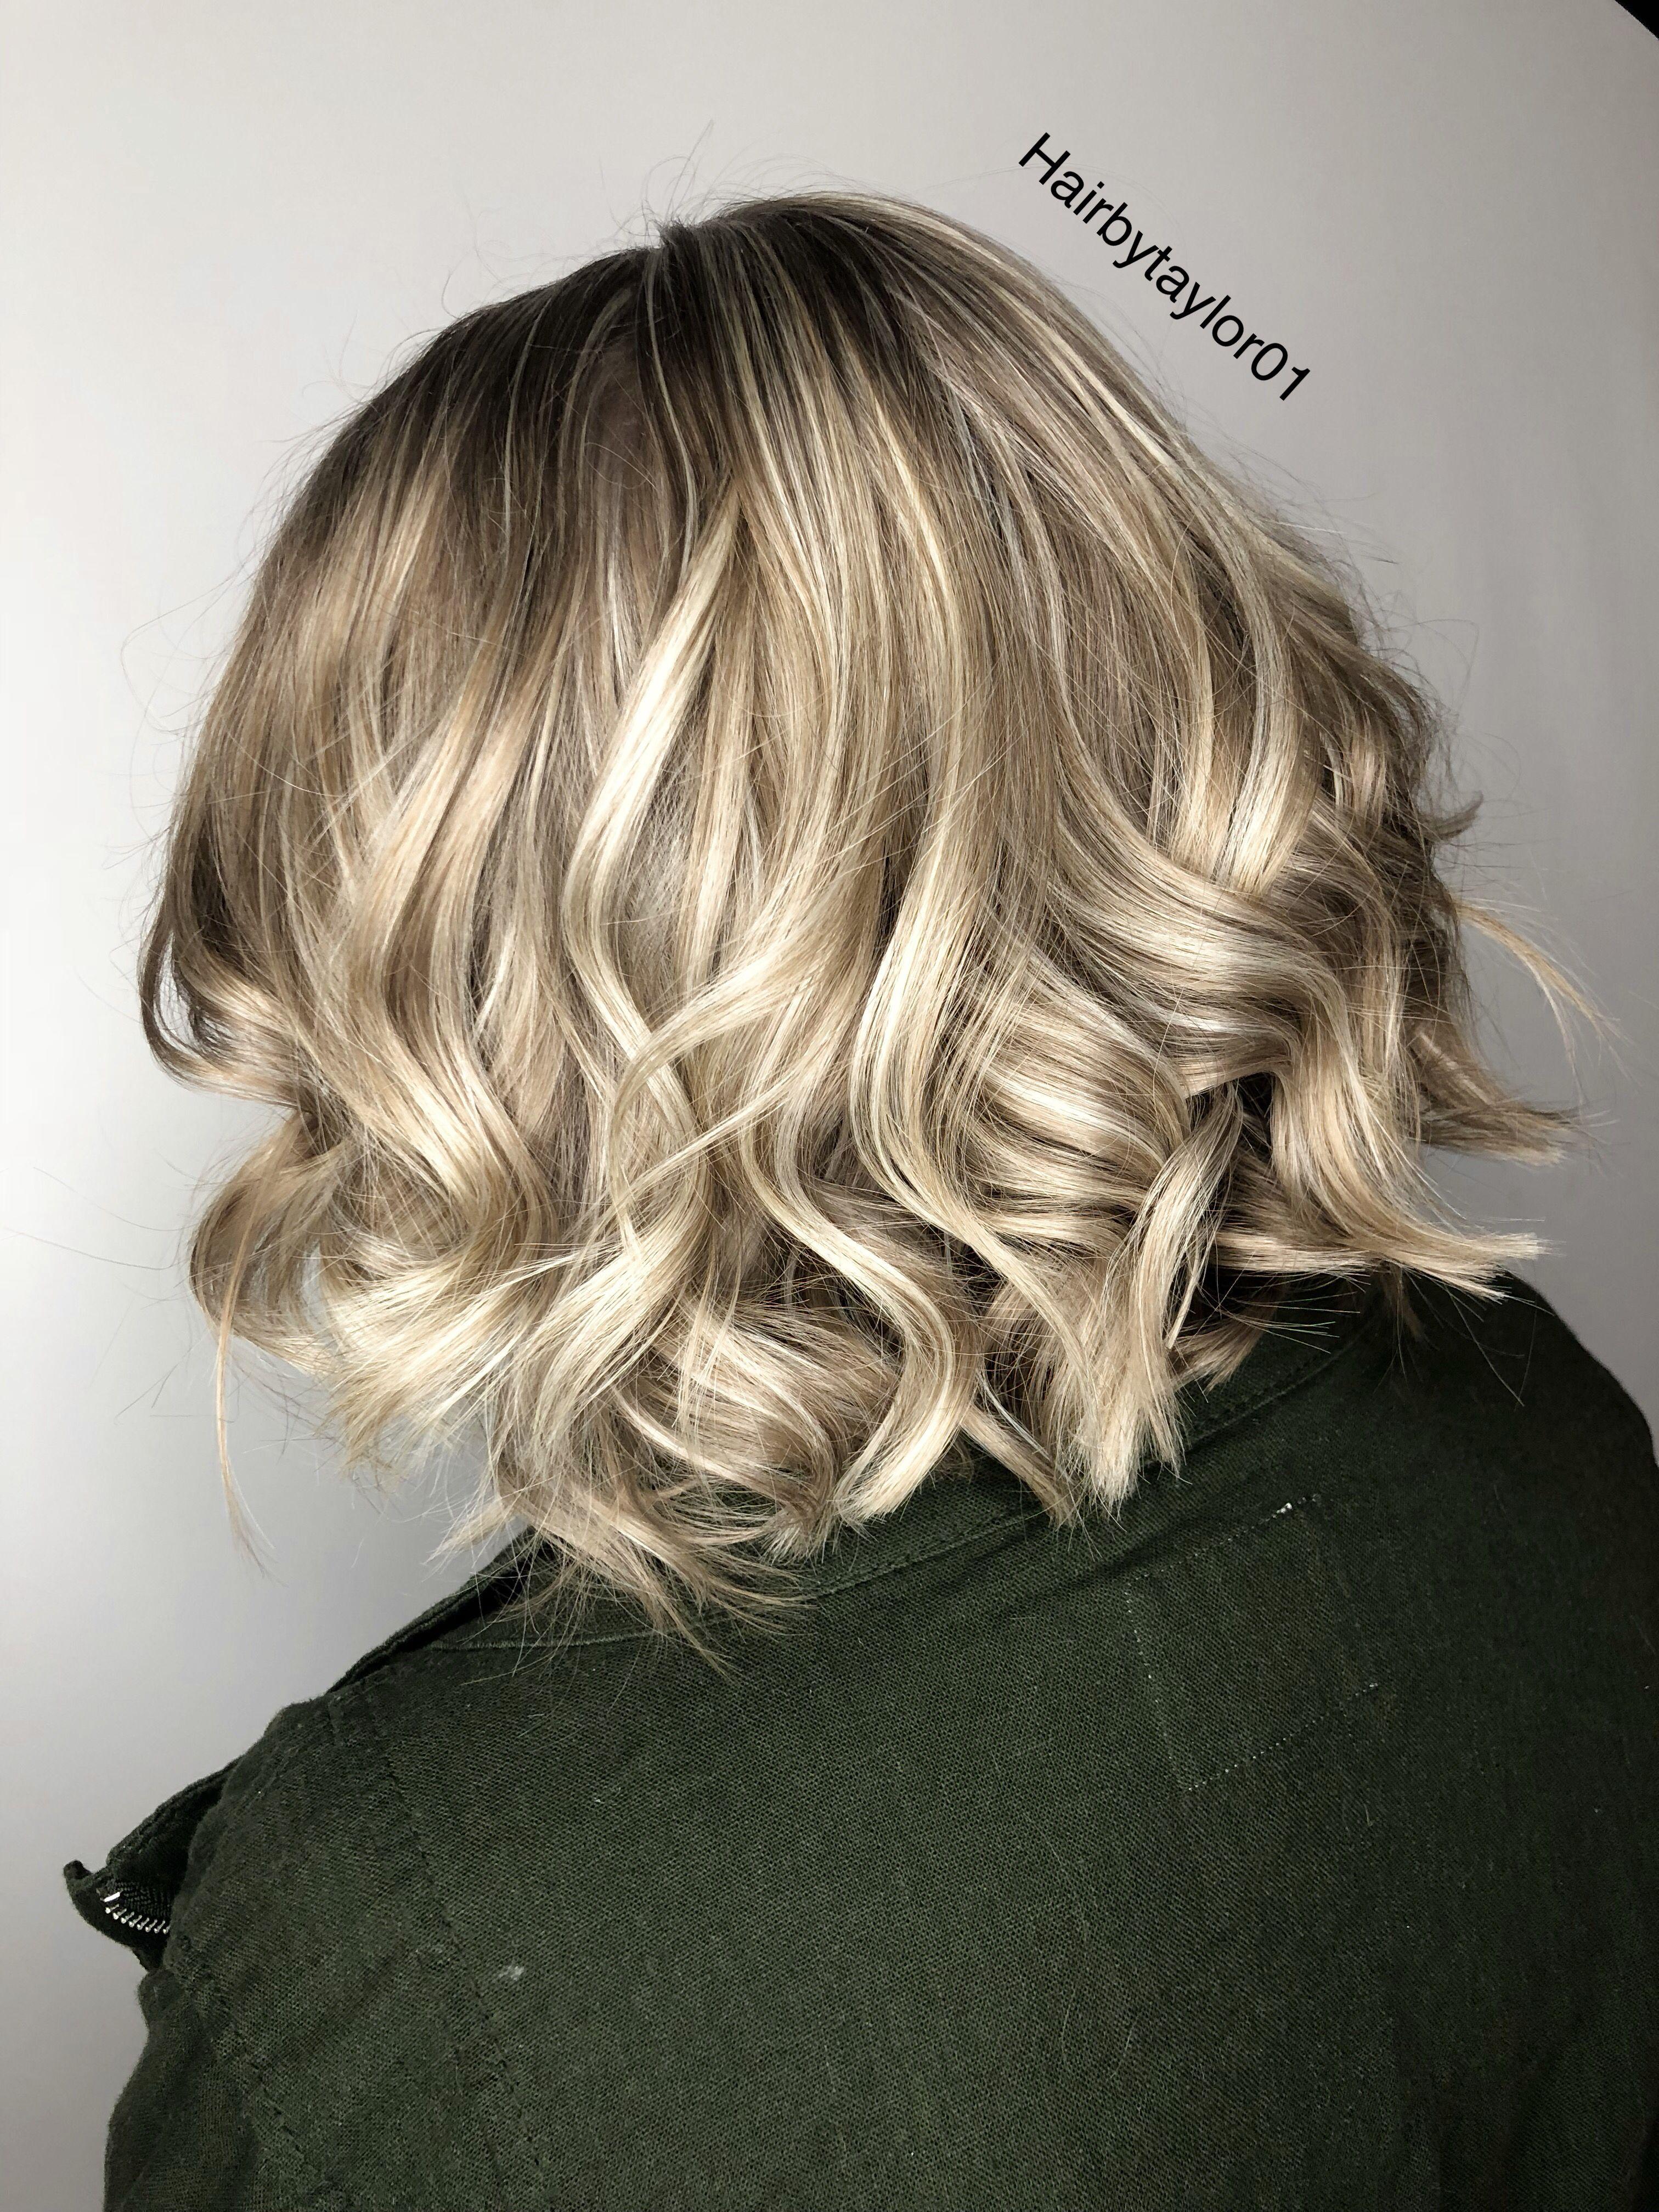 Light blonde highlights on dark blonde short hair ...